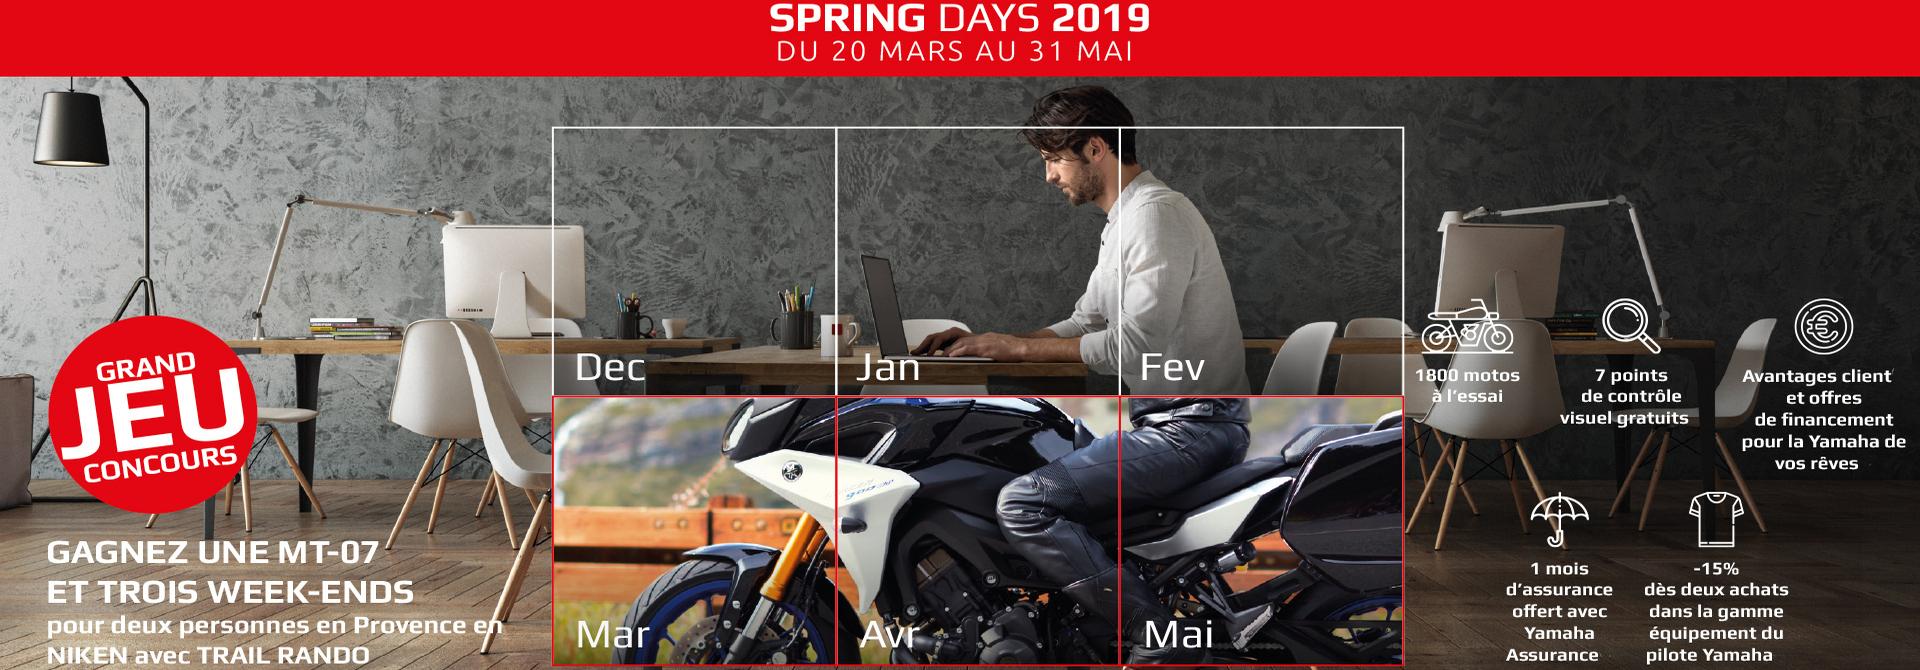 Springdays